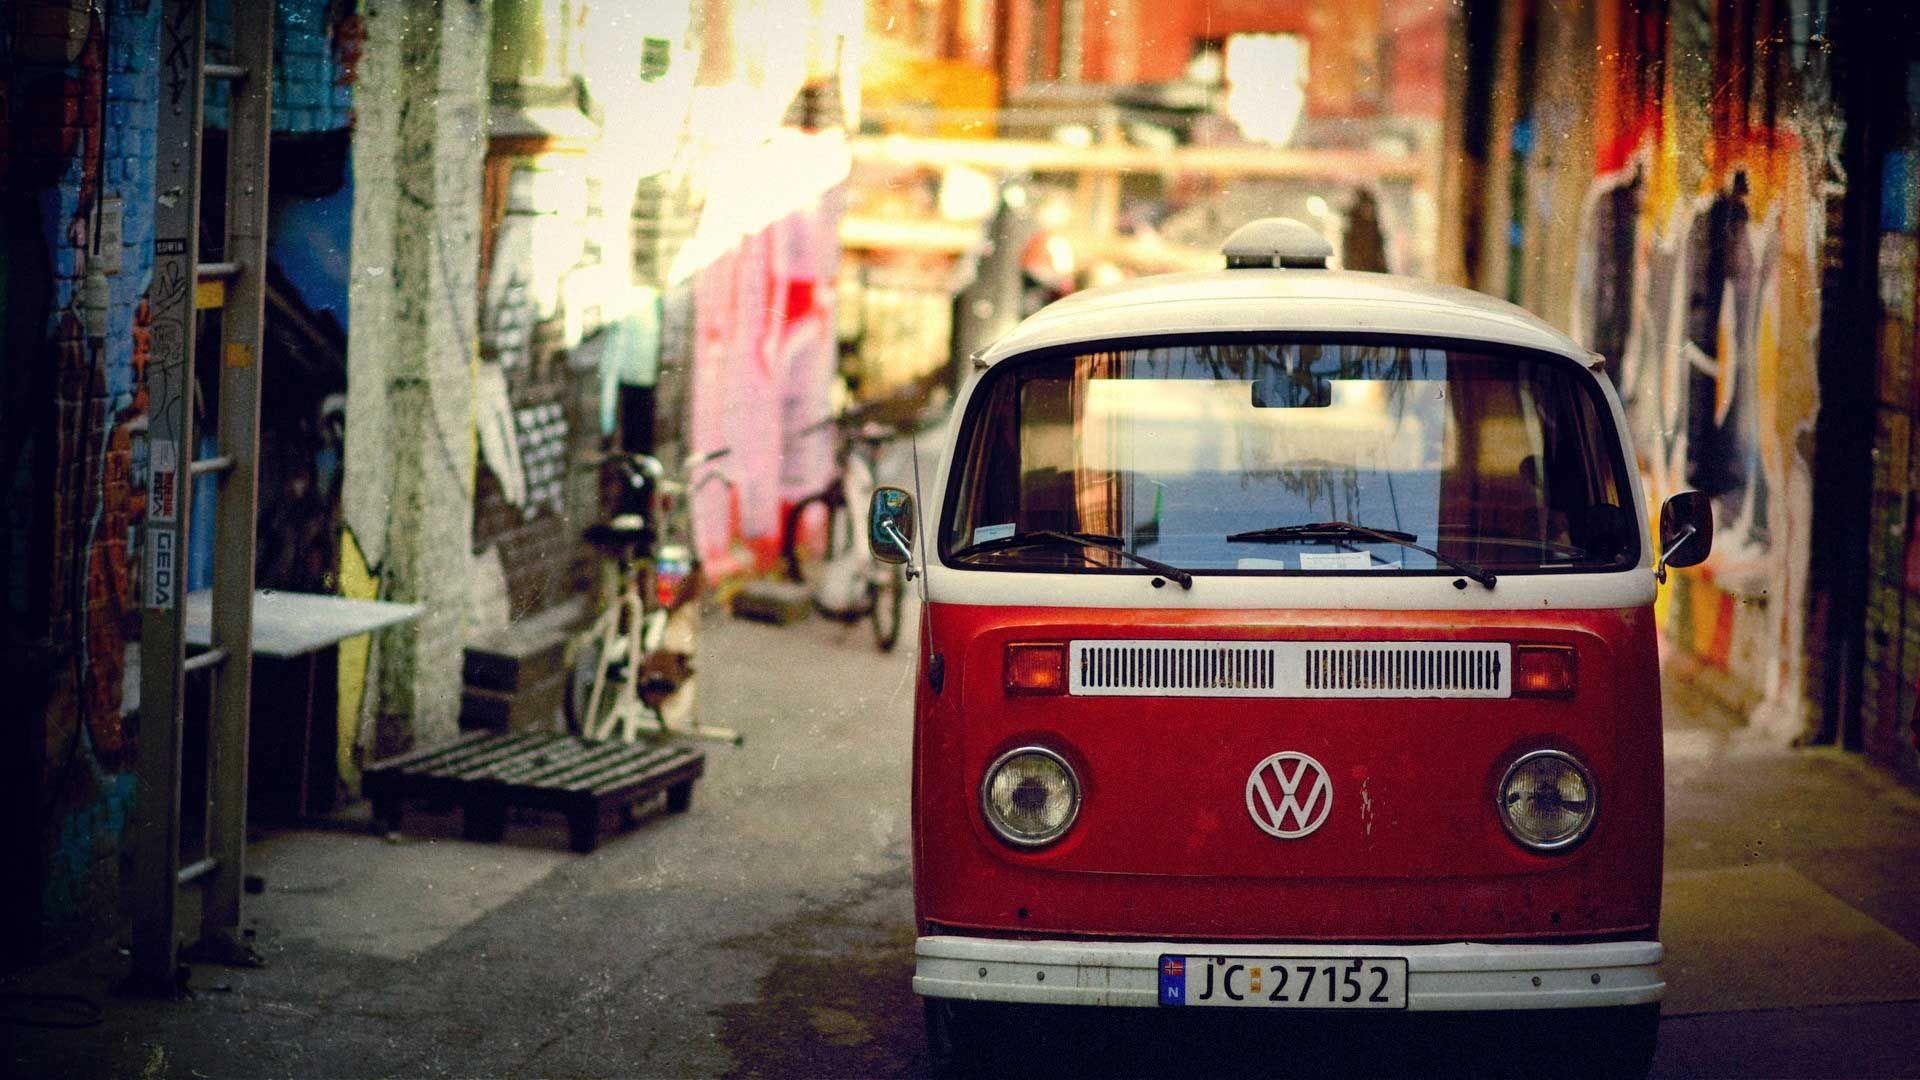 Classic Cars Wallpapers Hd Vintage Vw Bus Vintage Volkswagen Volkswagen Bus Hd wallpaper retro old volkswagen van